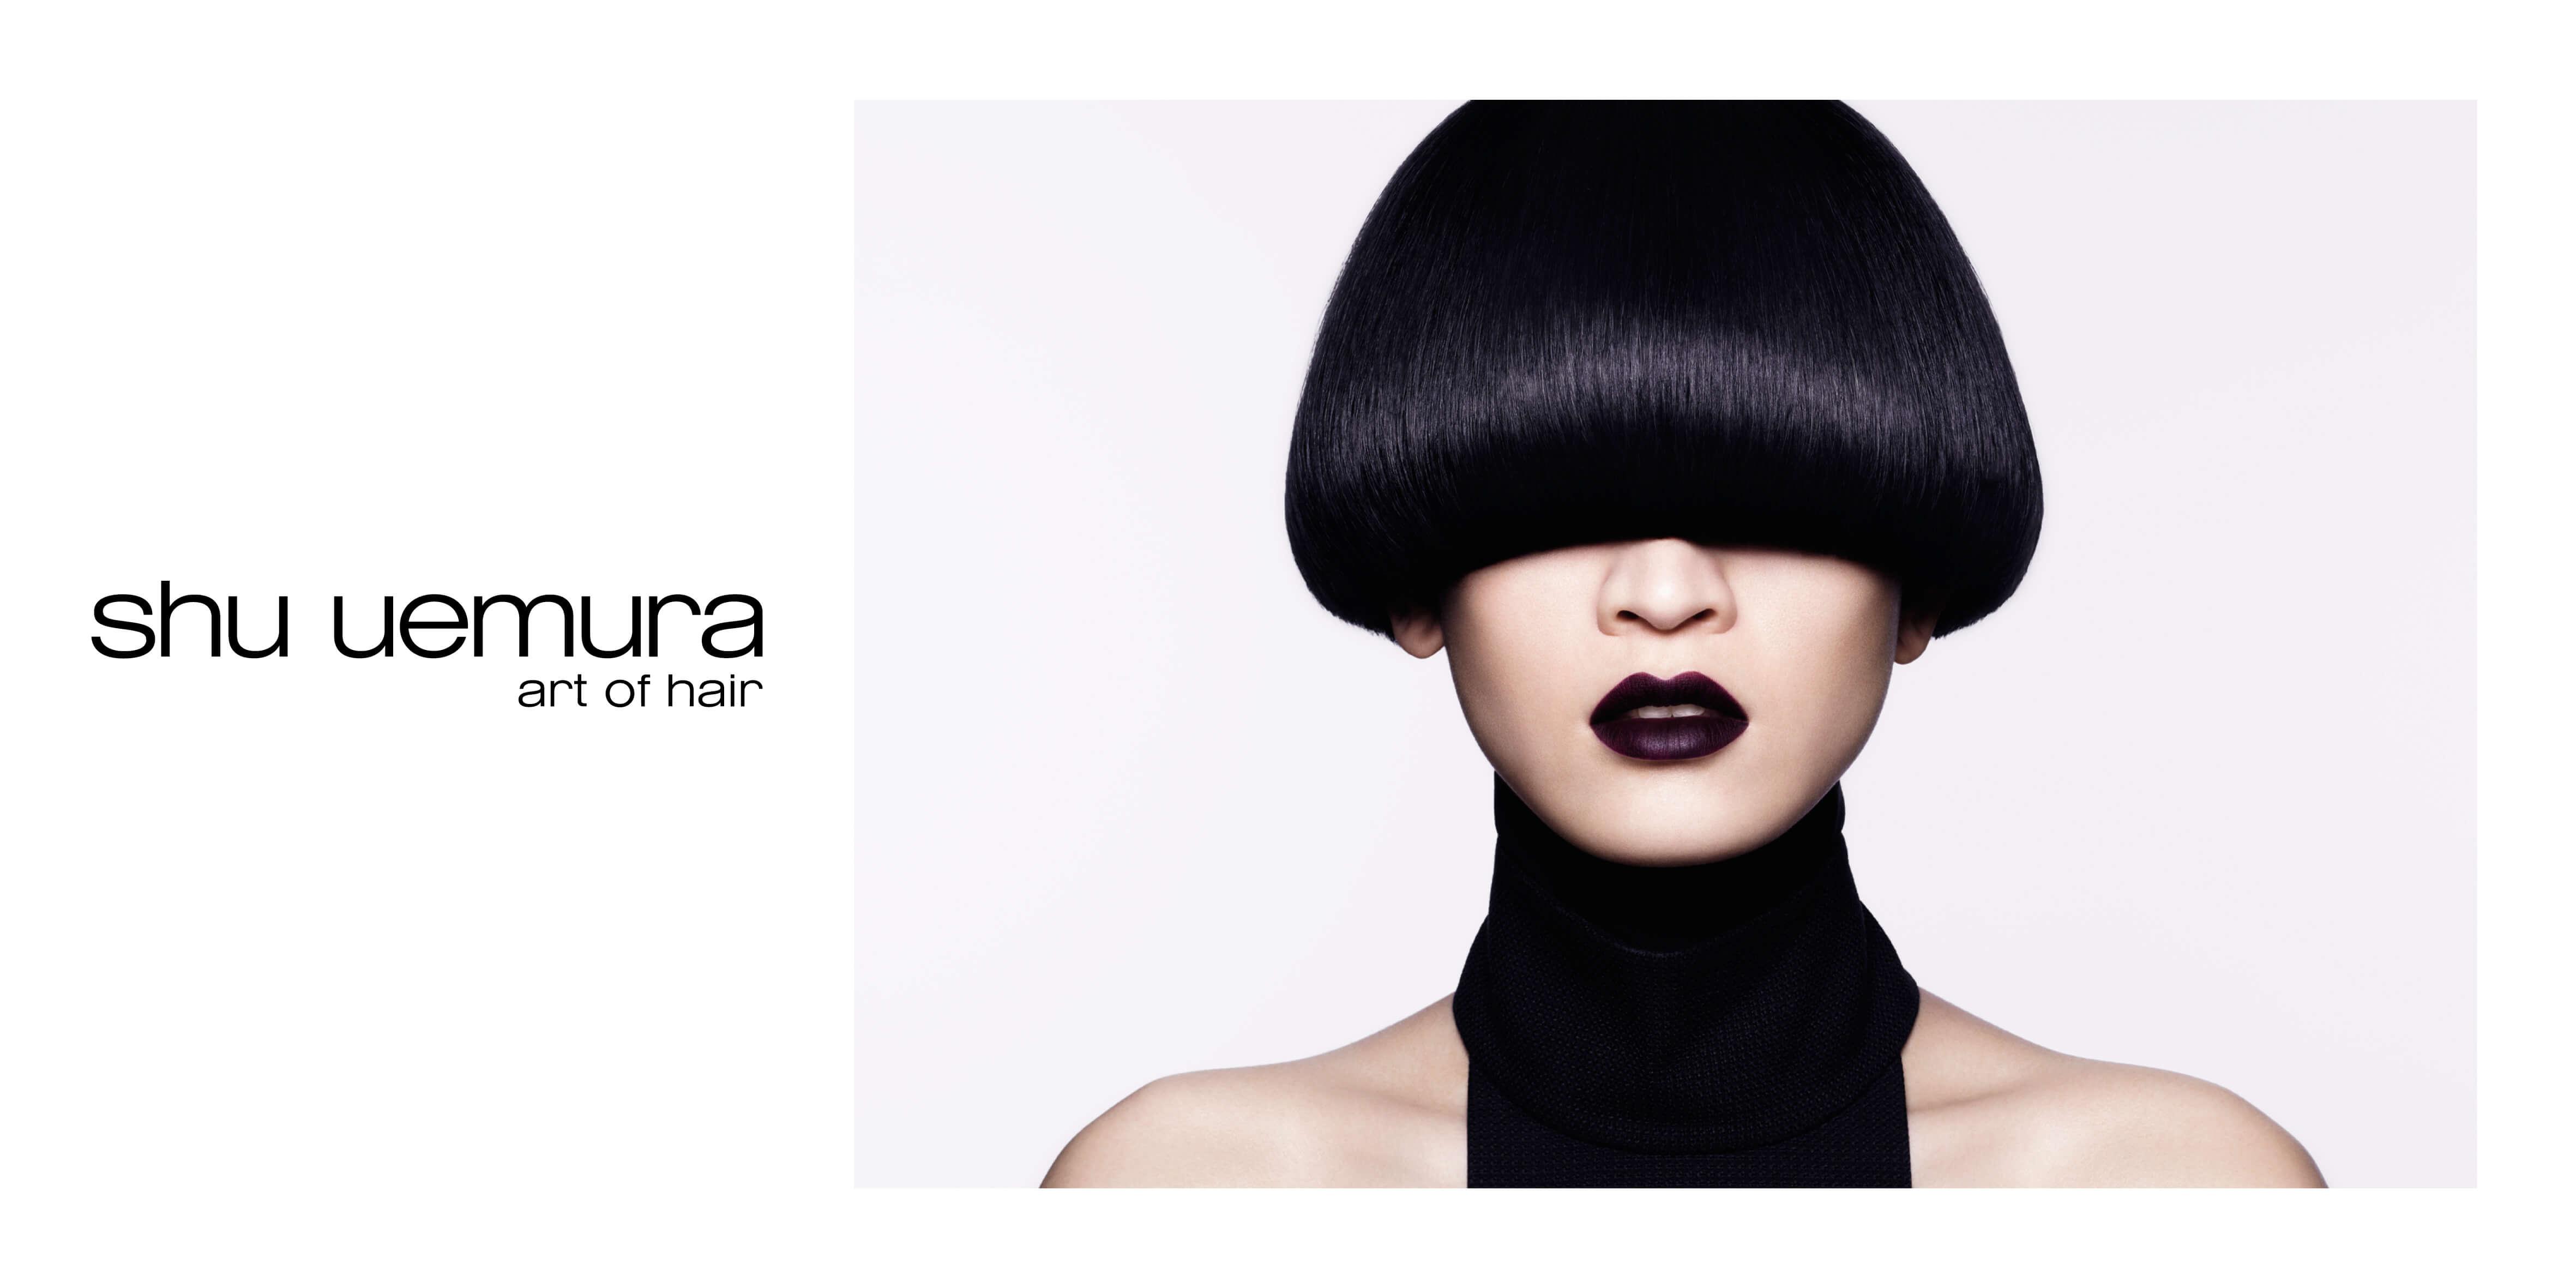 Shu Uemura new brand Letif.gr